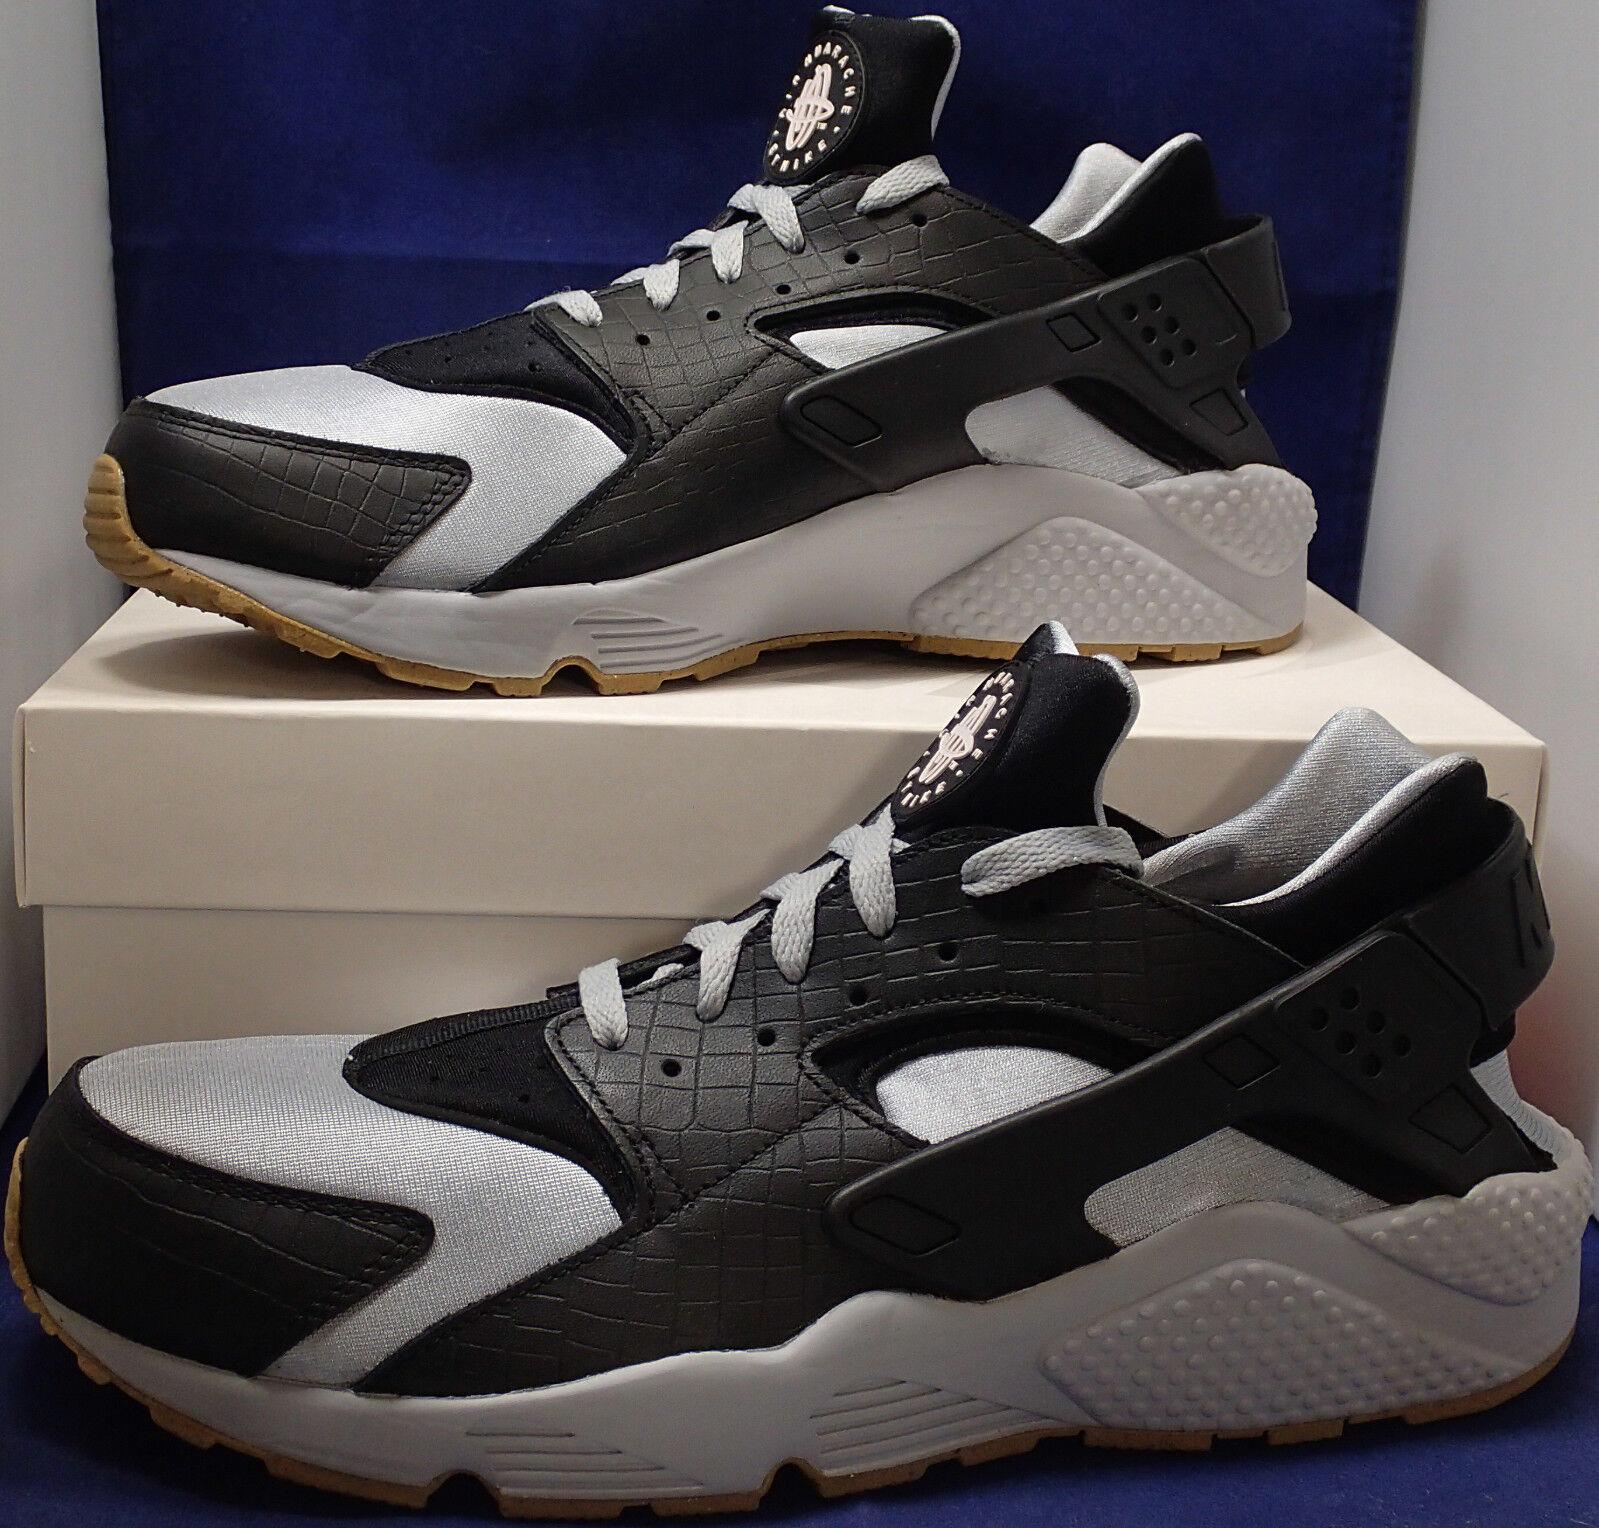 Nike Air Huarache Run iD Croc Grey Black Light Gum Brown Price reduction